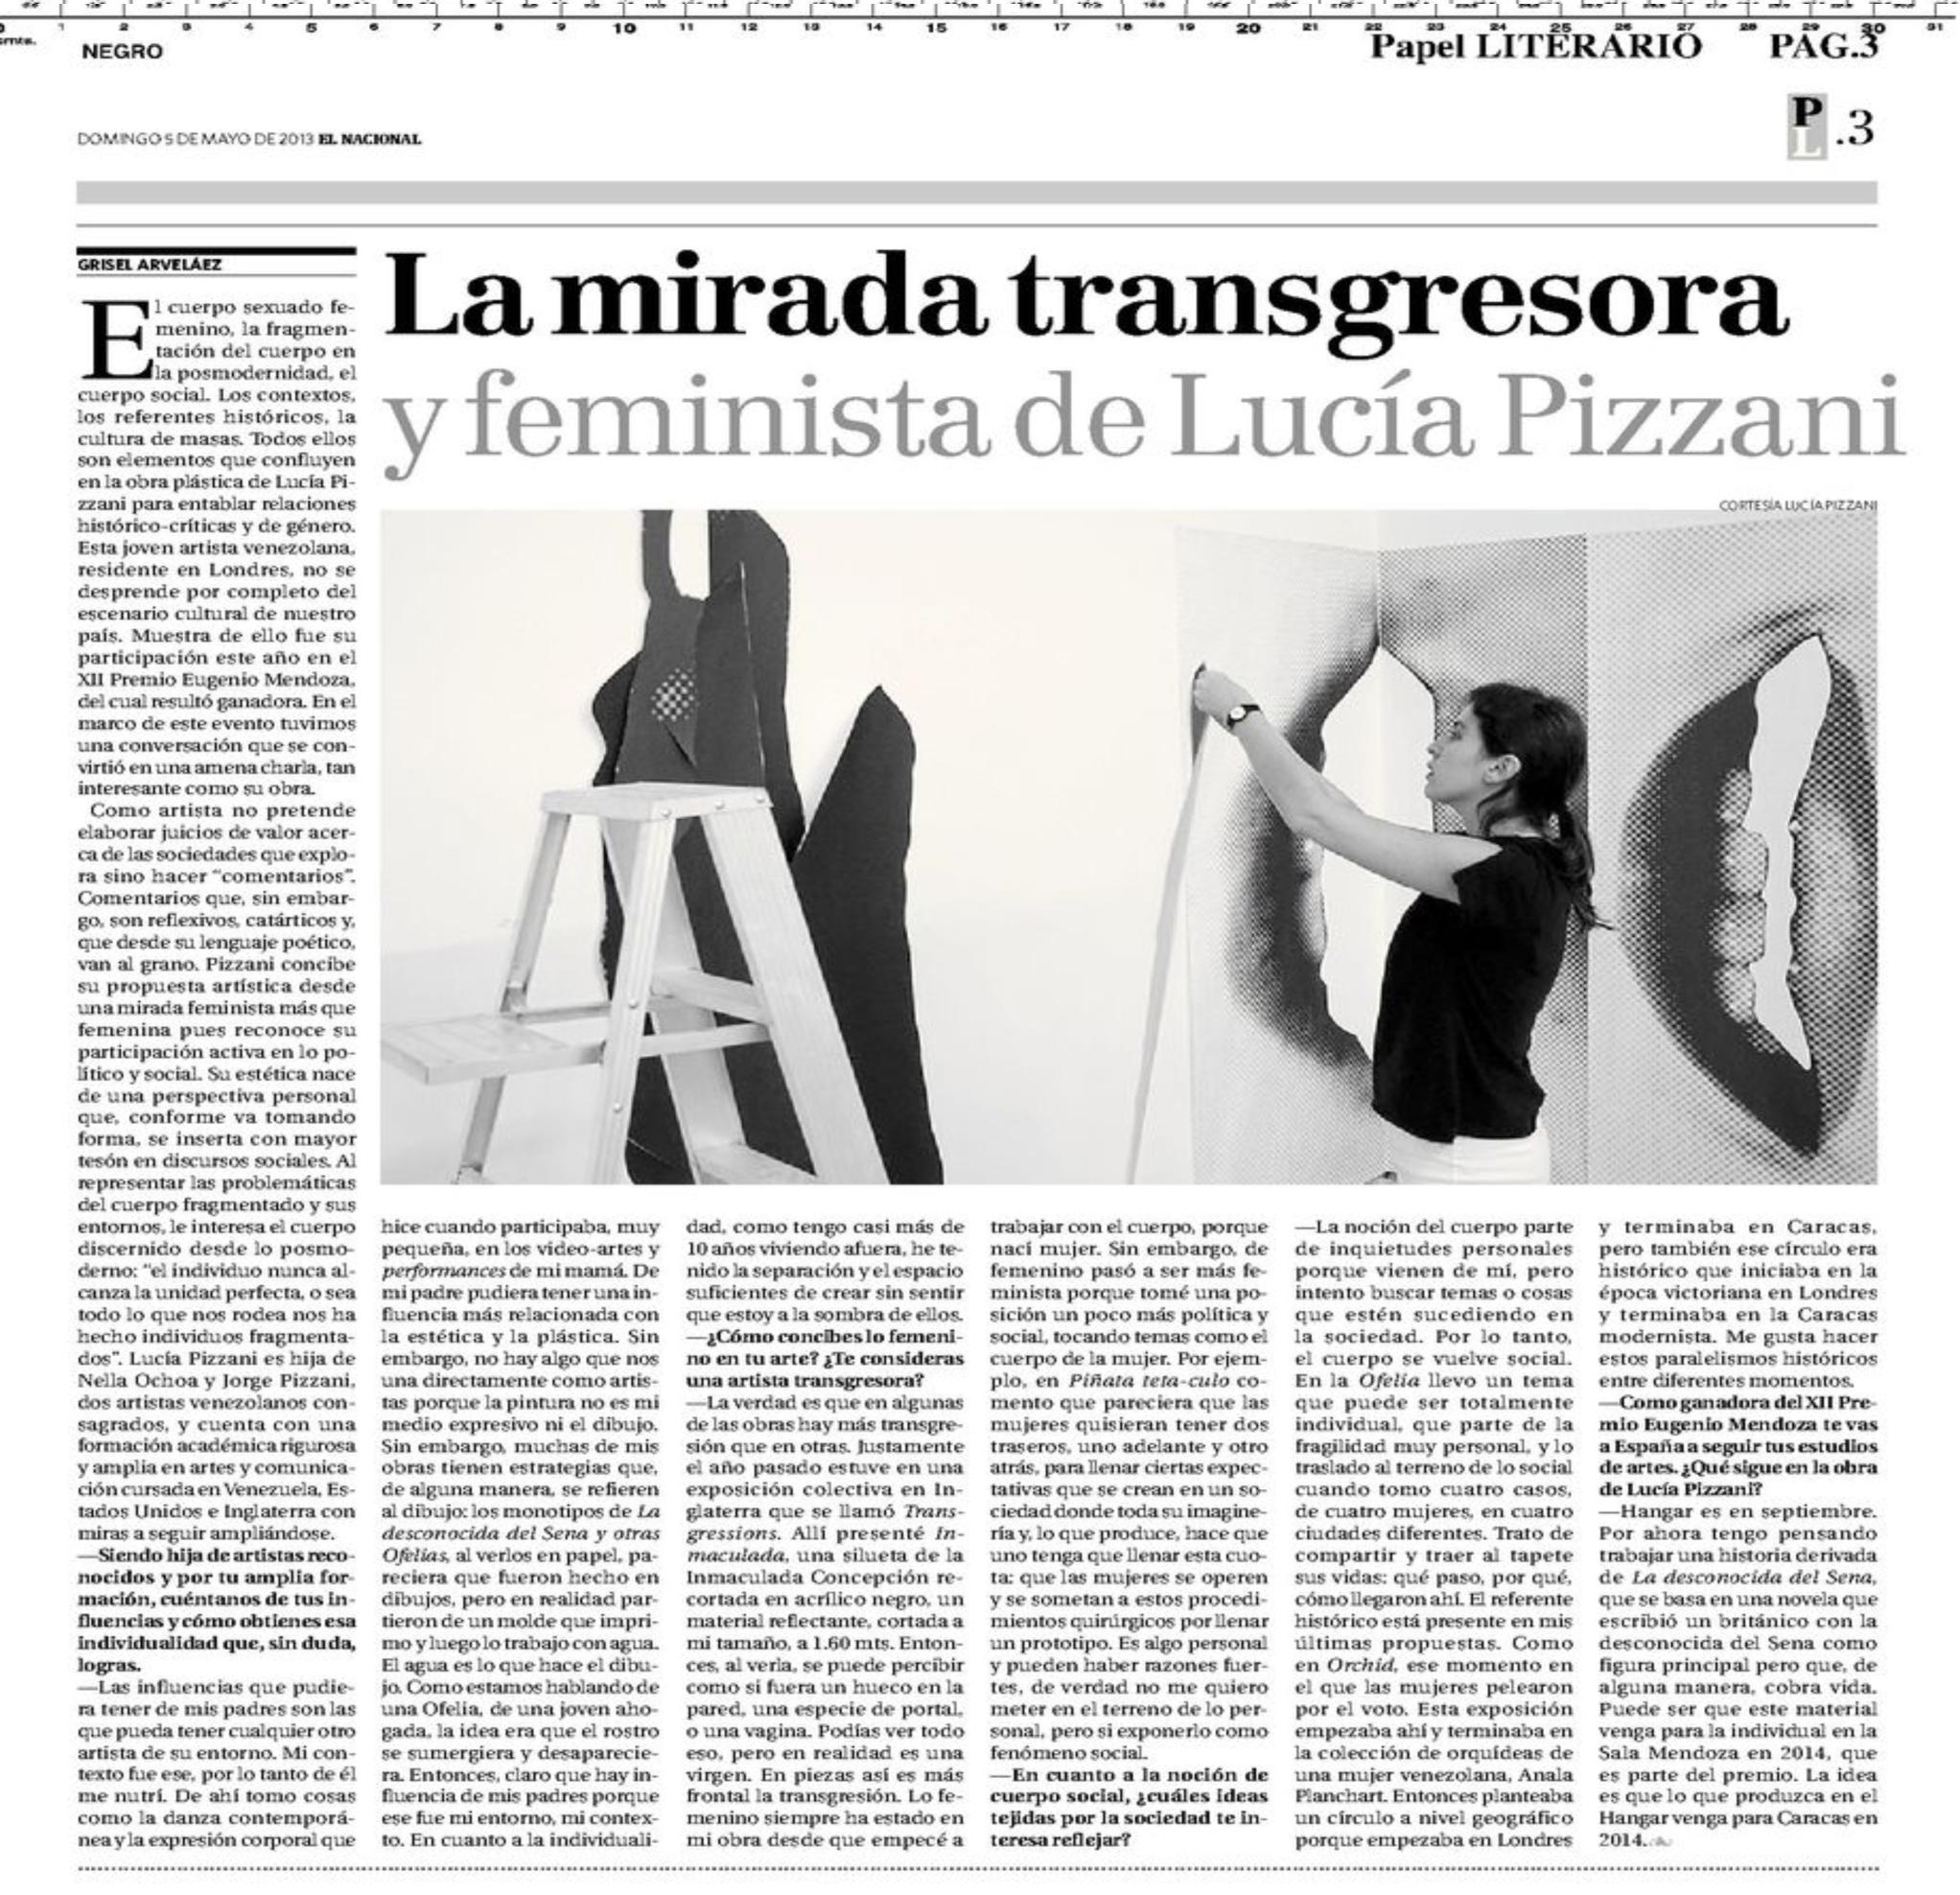 Entrevista Papel lIterario.jpg